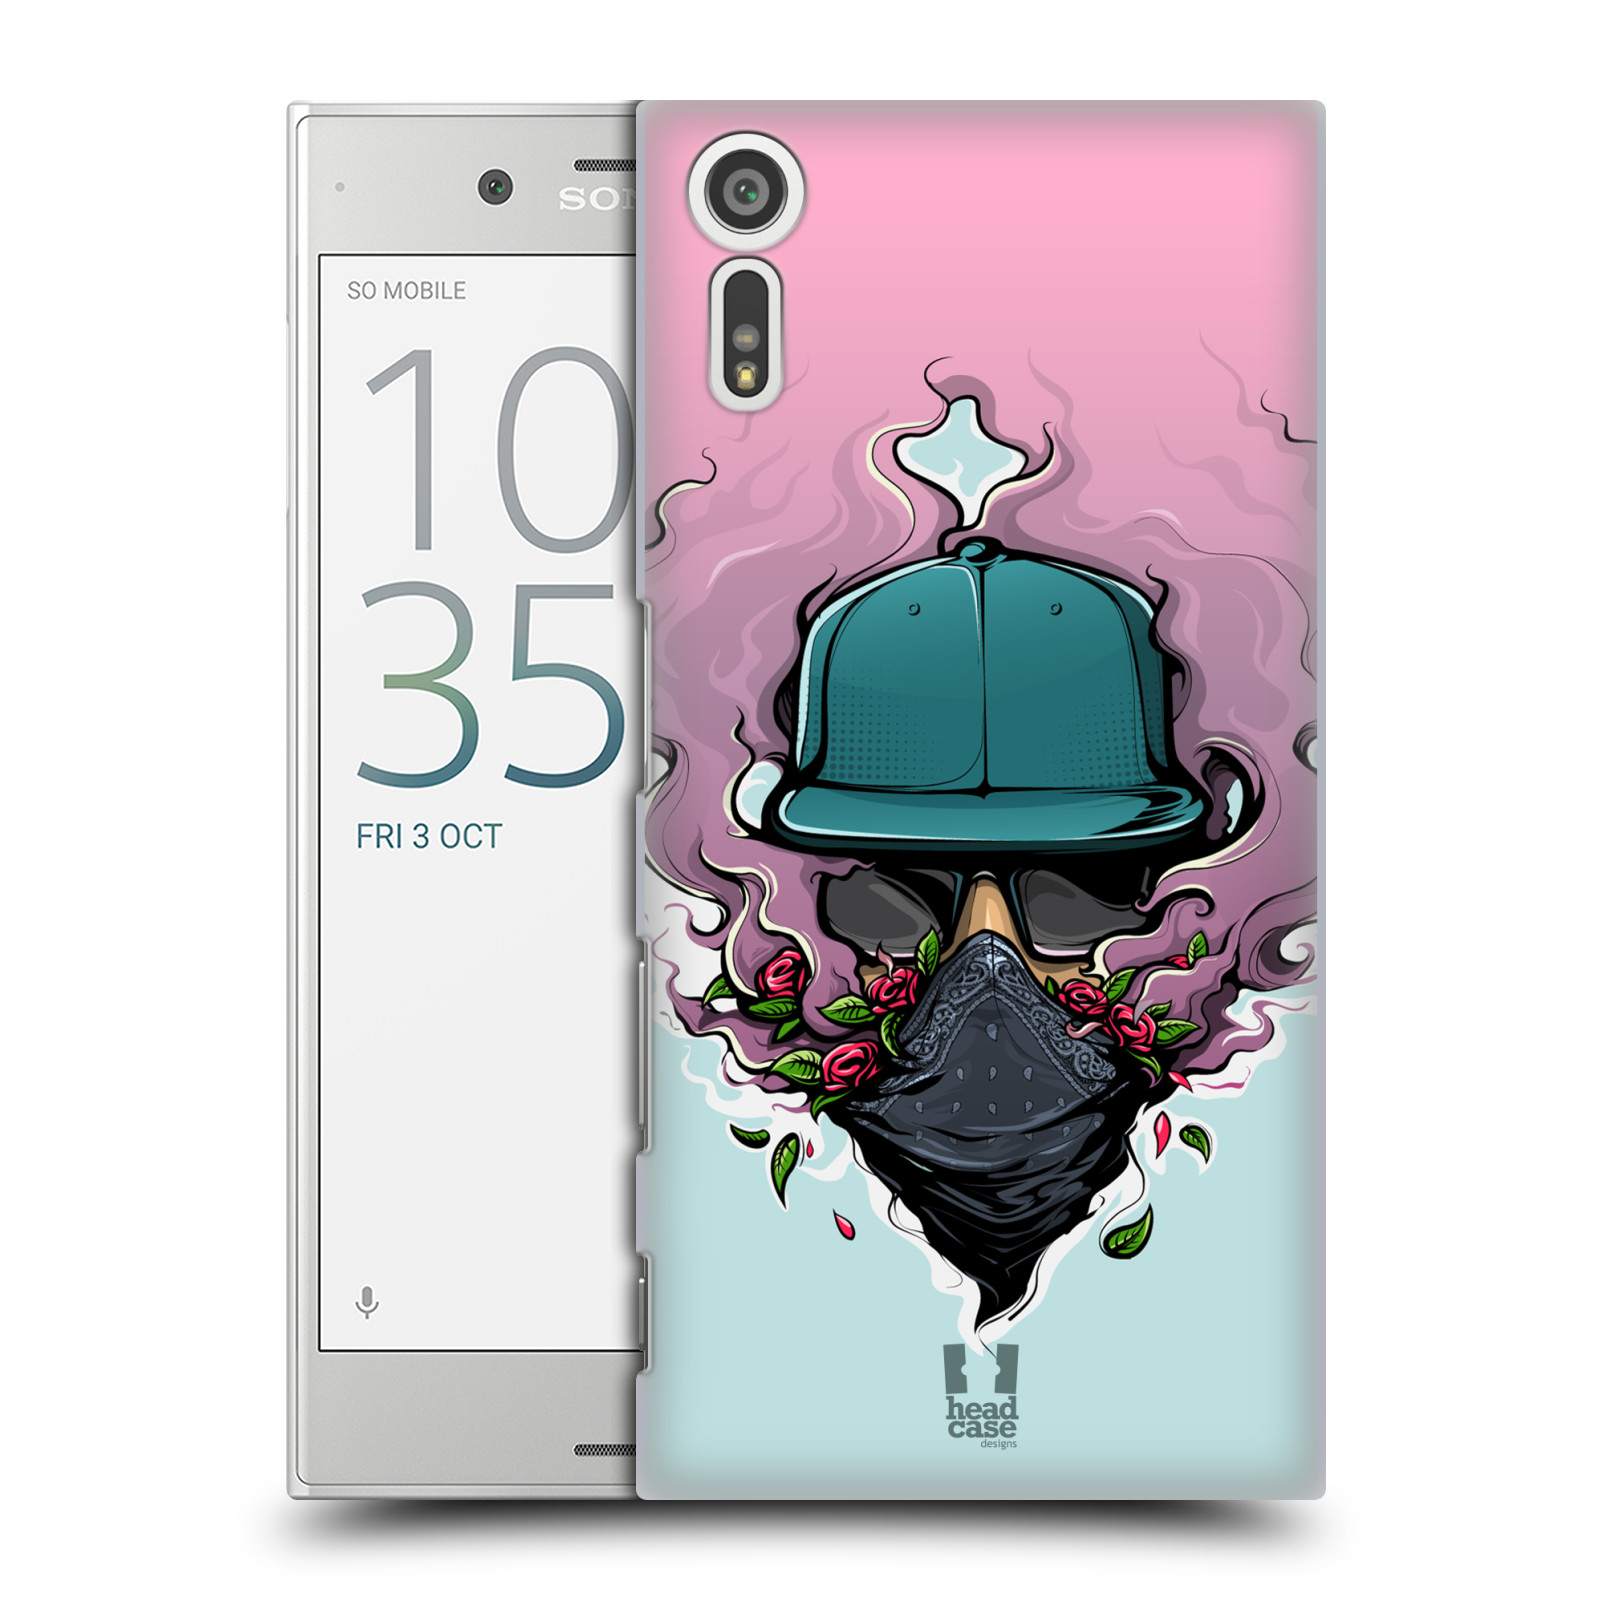 Funda HEAD CASE DESIGNS urbano Vibes Funda Rígida Posterior Para Sony Xperia Xz